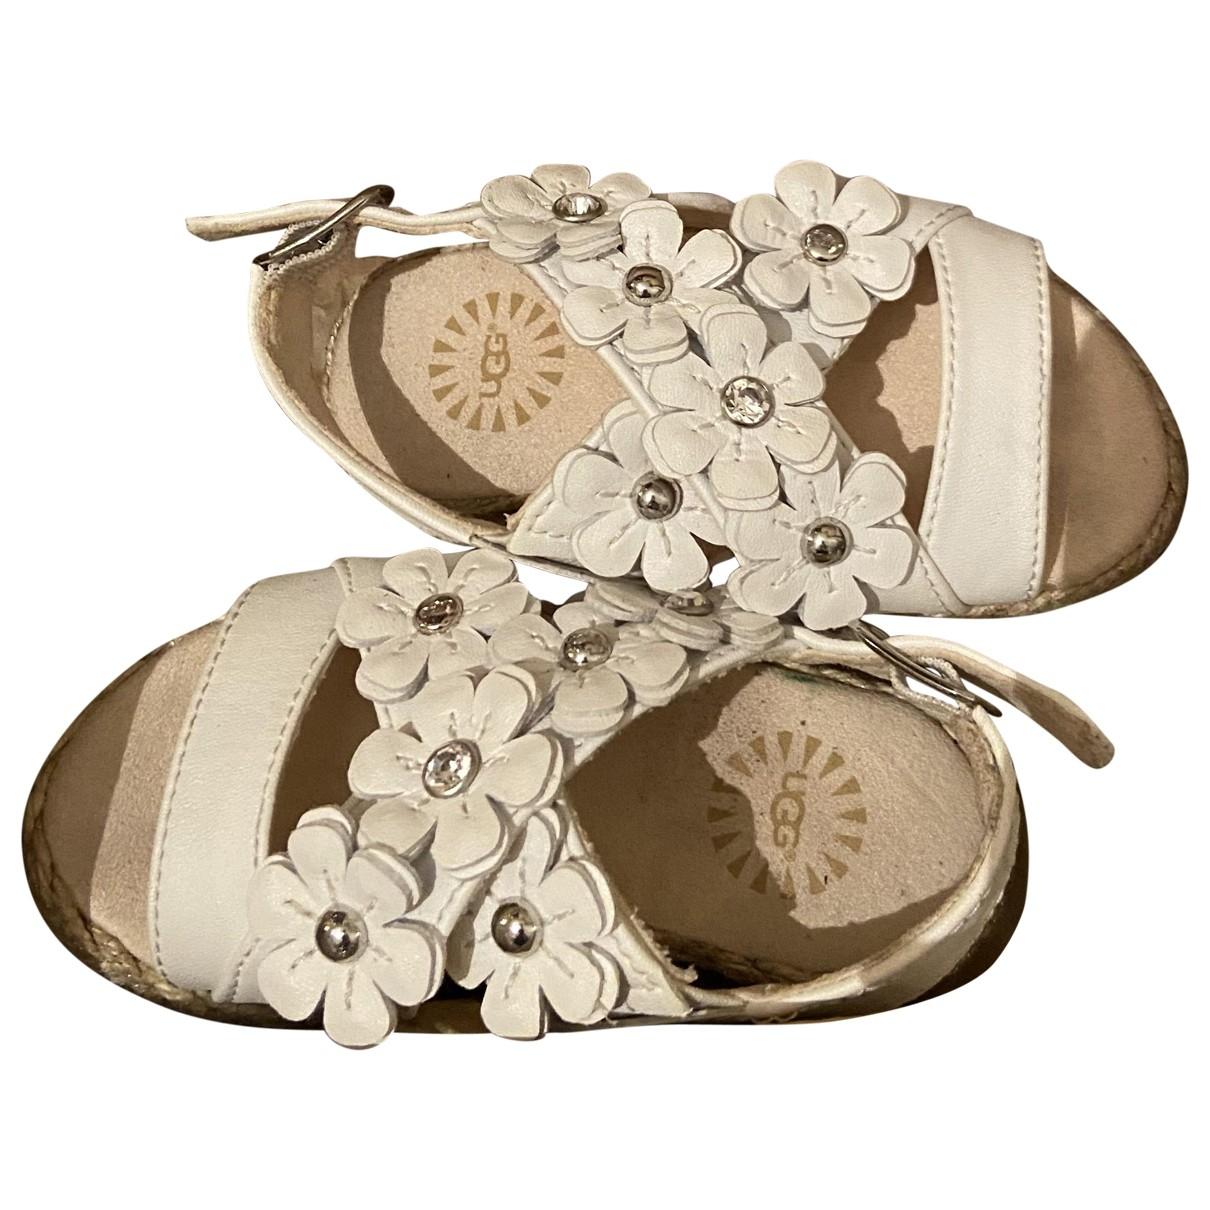 Ugg - Sandales   pour enfant en cuir - blanc